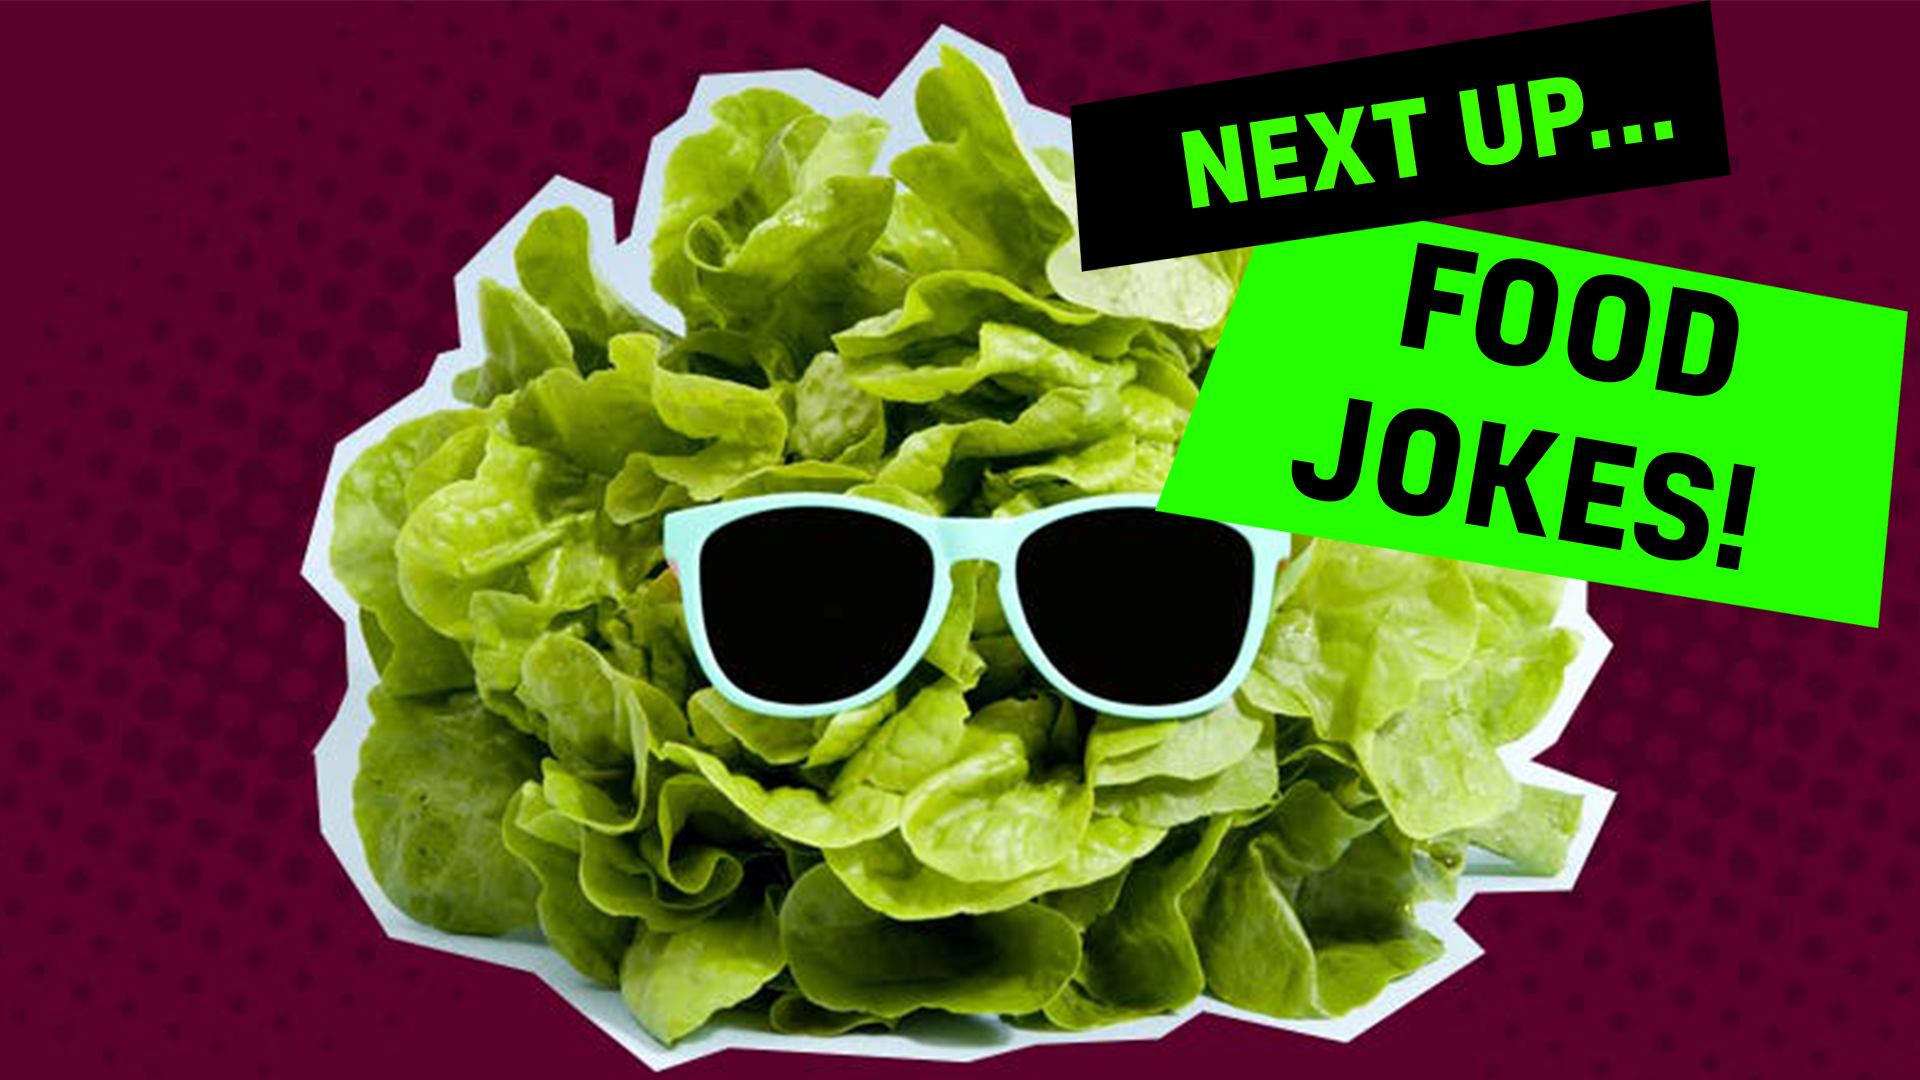 Next up: food jokes